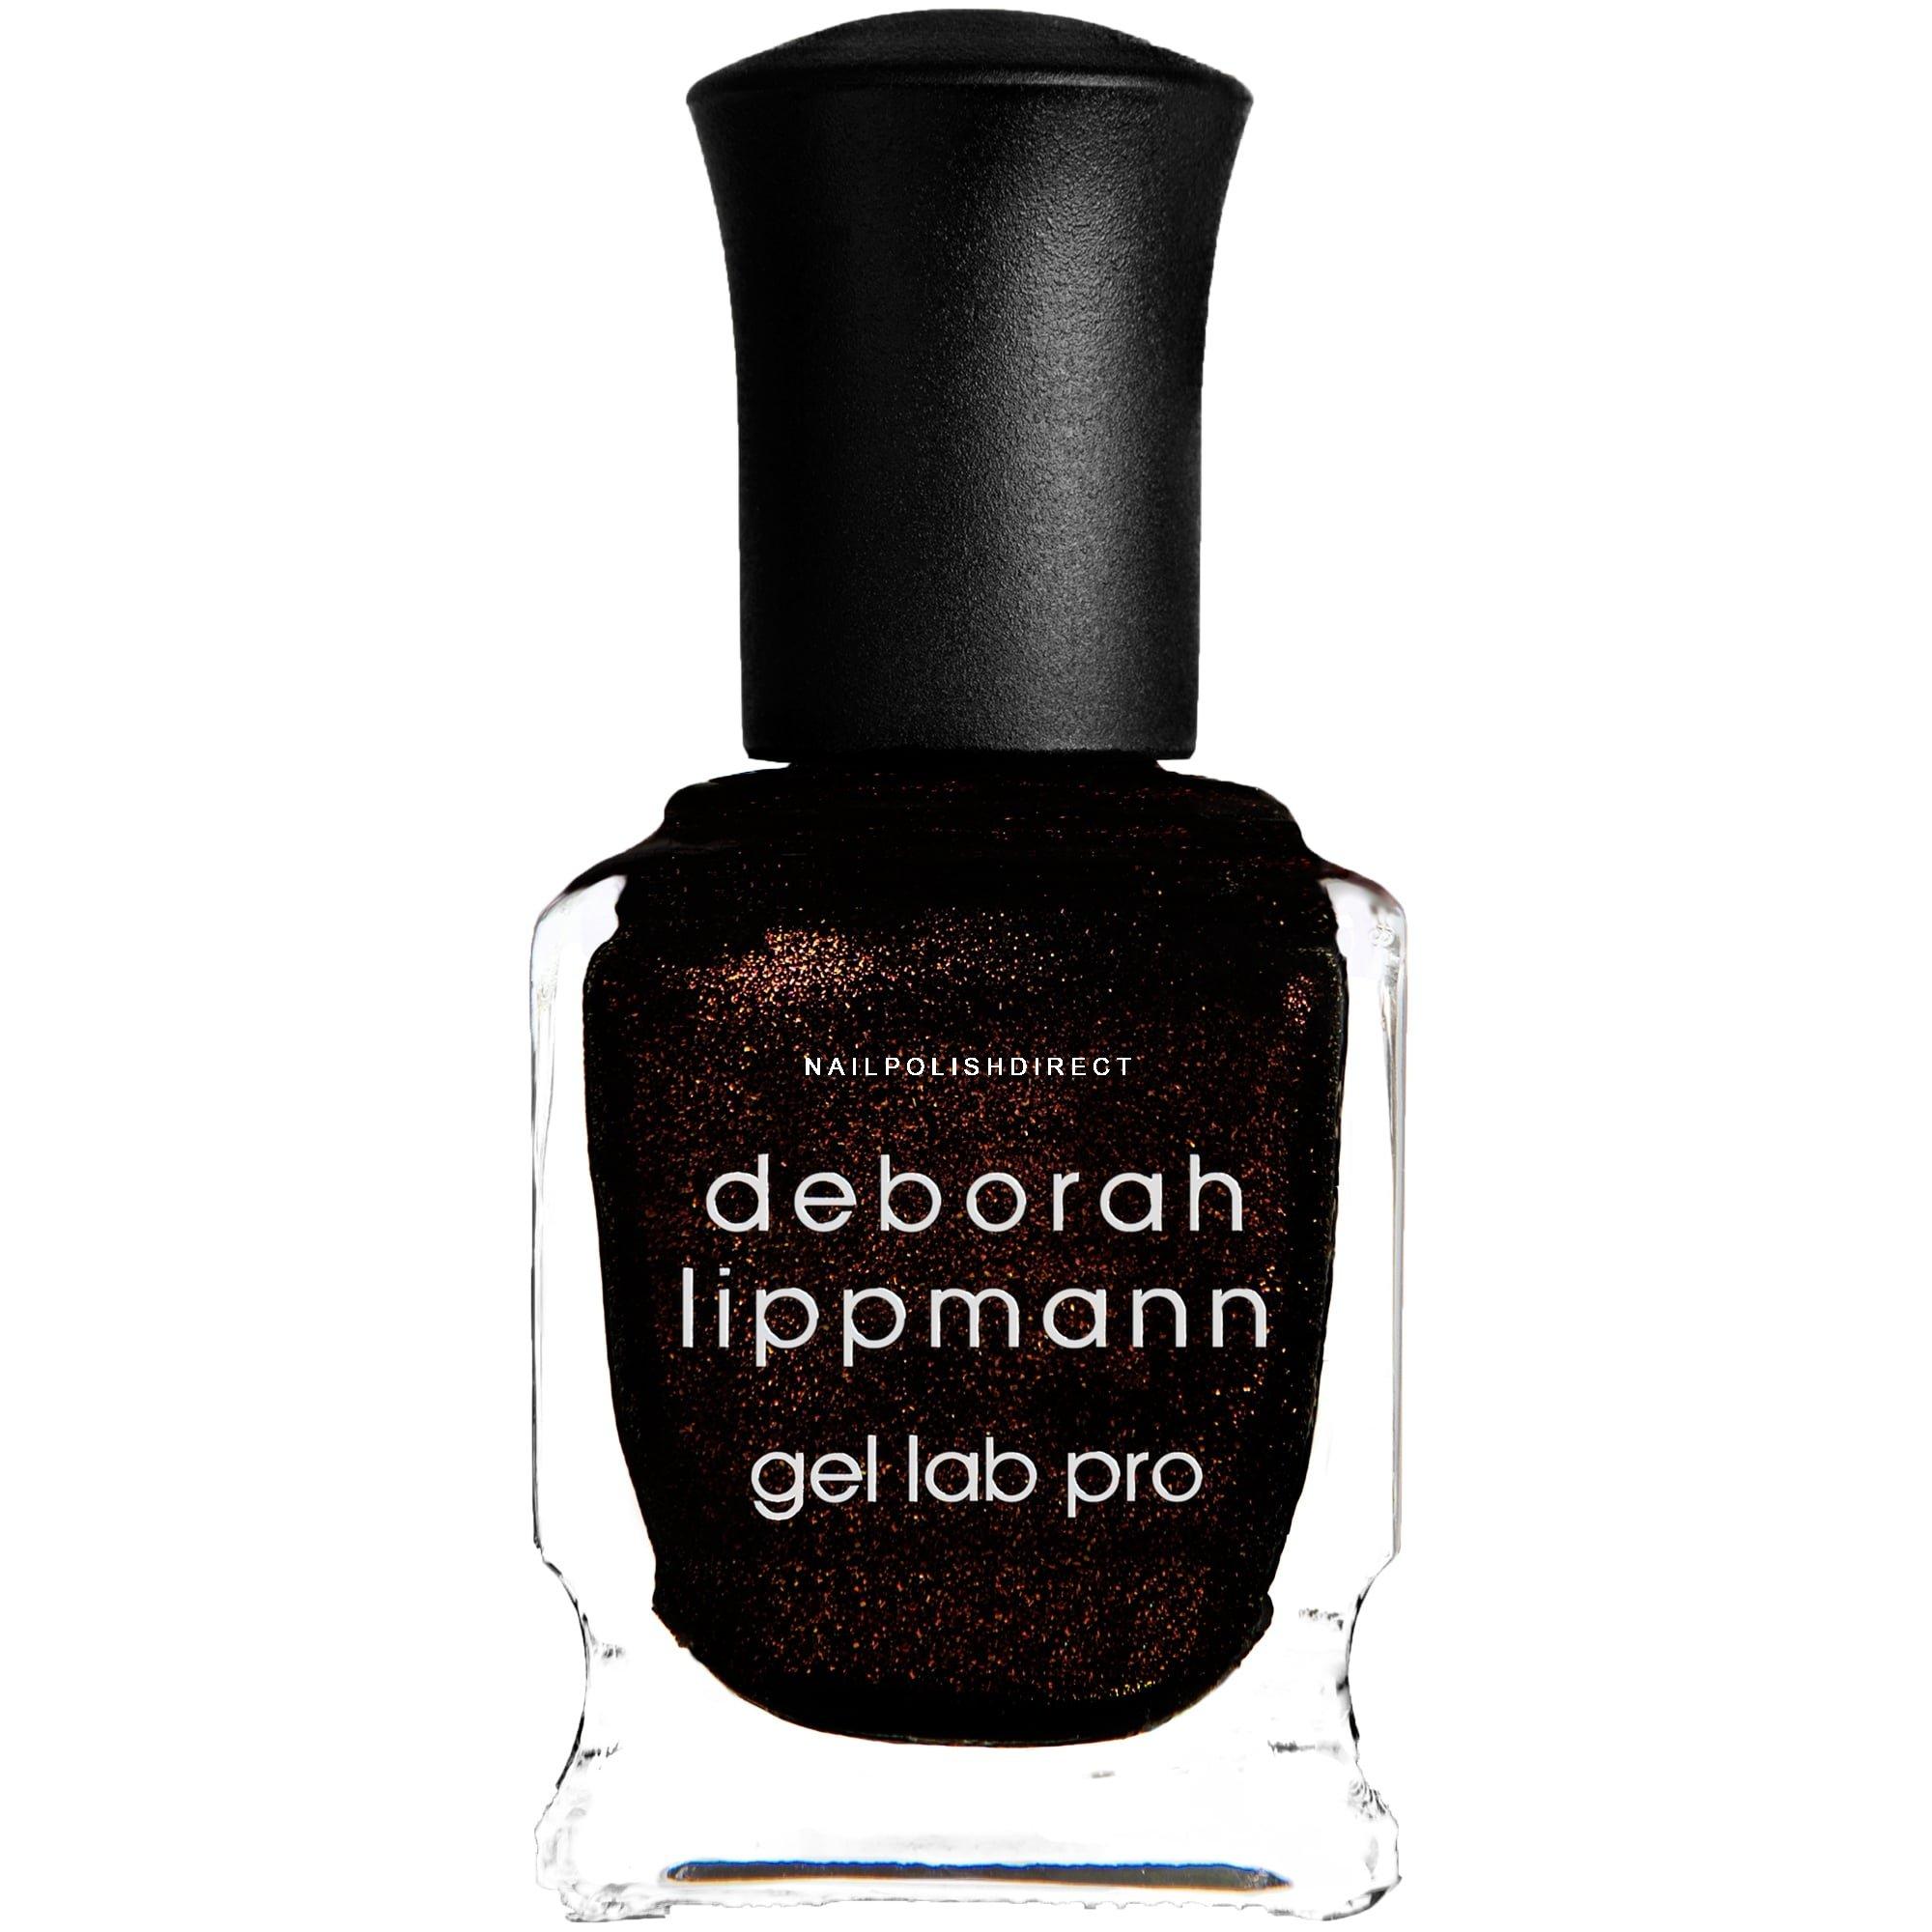 Deborah Lippmann After Midnight Collection - All Night Long (20412)